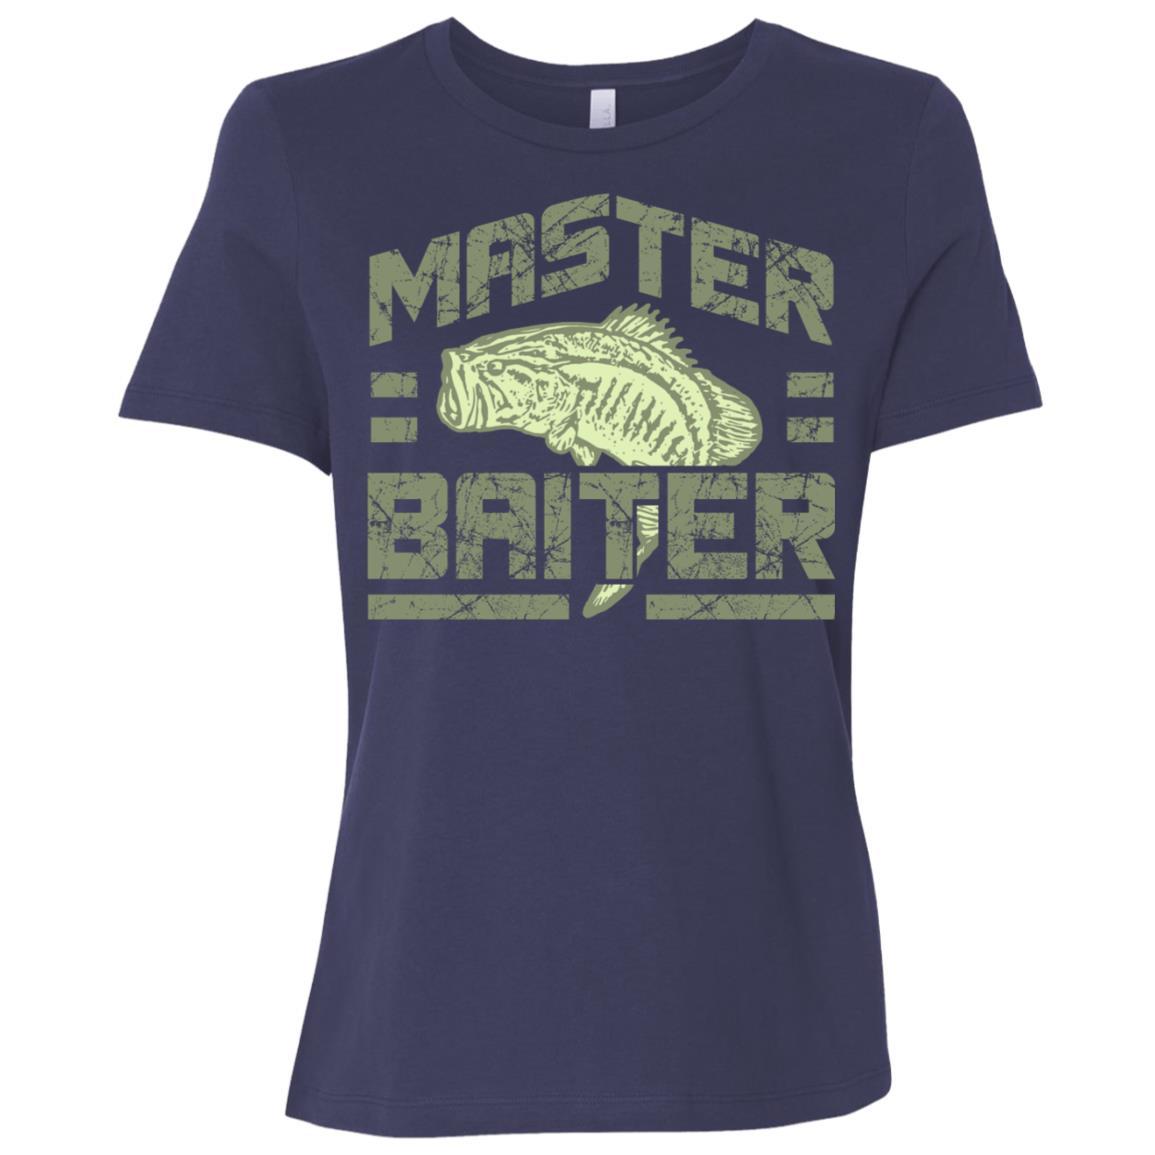 Funny Fishing Great Fisher Lover Gift Wear-4 Women Short Sleeve T-Shirt